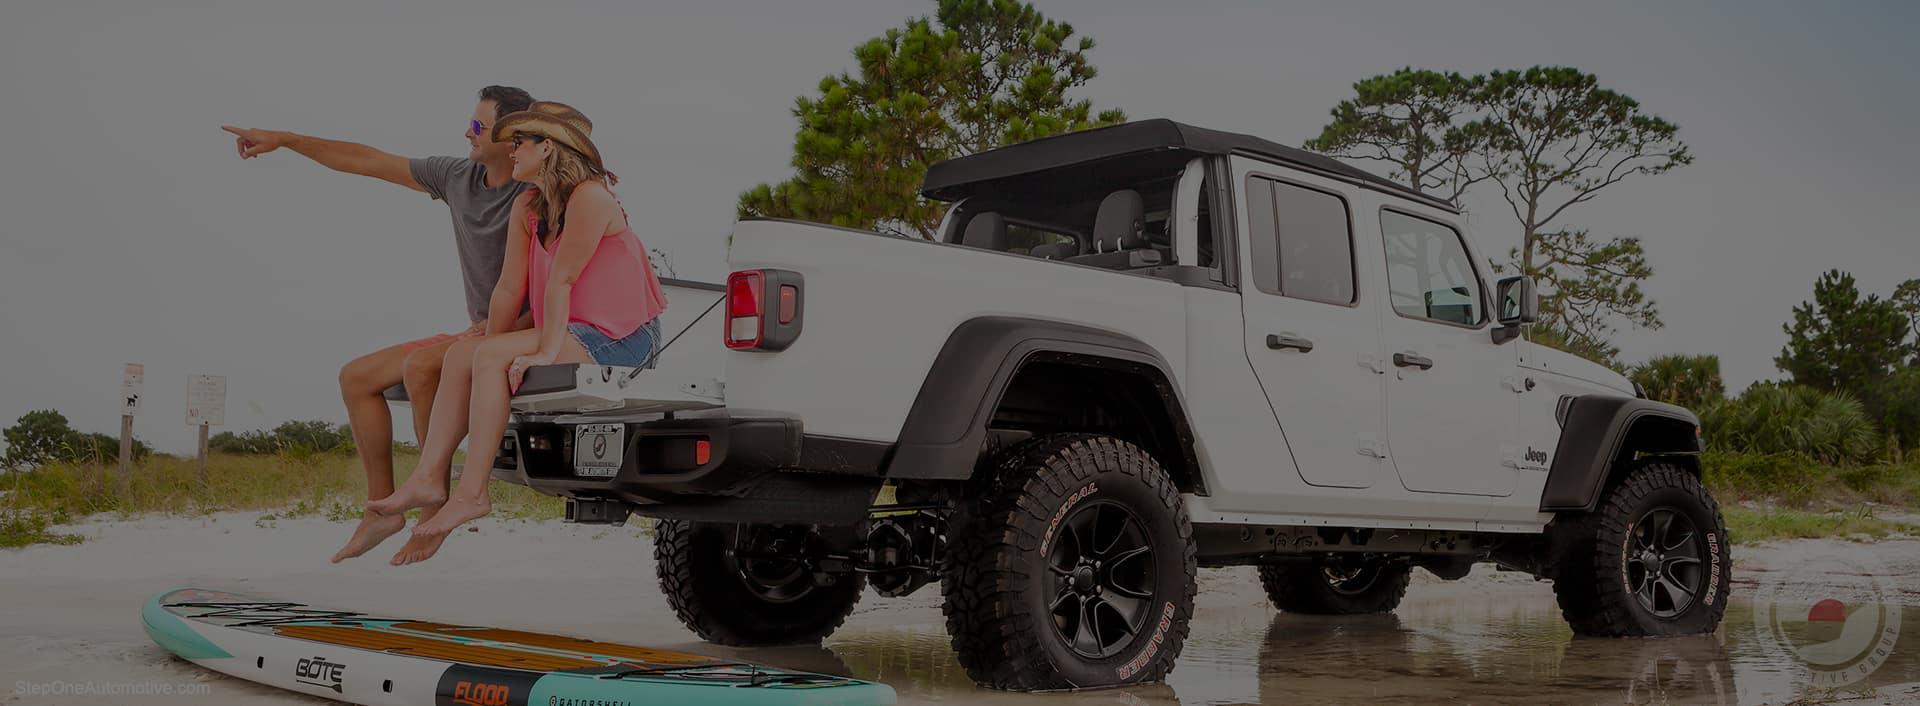 Chrysler Dodge Jeep Ram Fiat Ft Walton Cdjrf Dealer